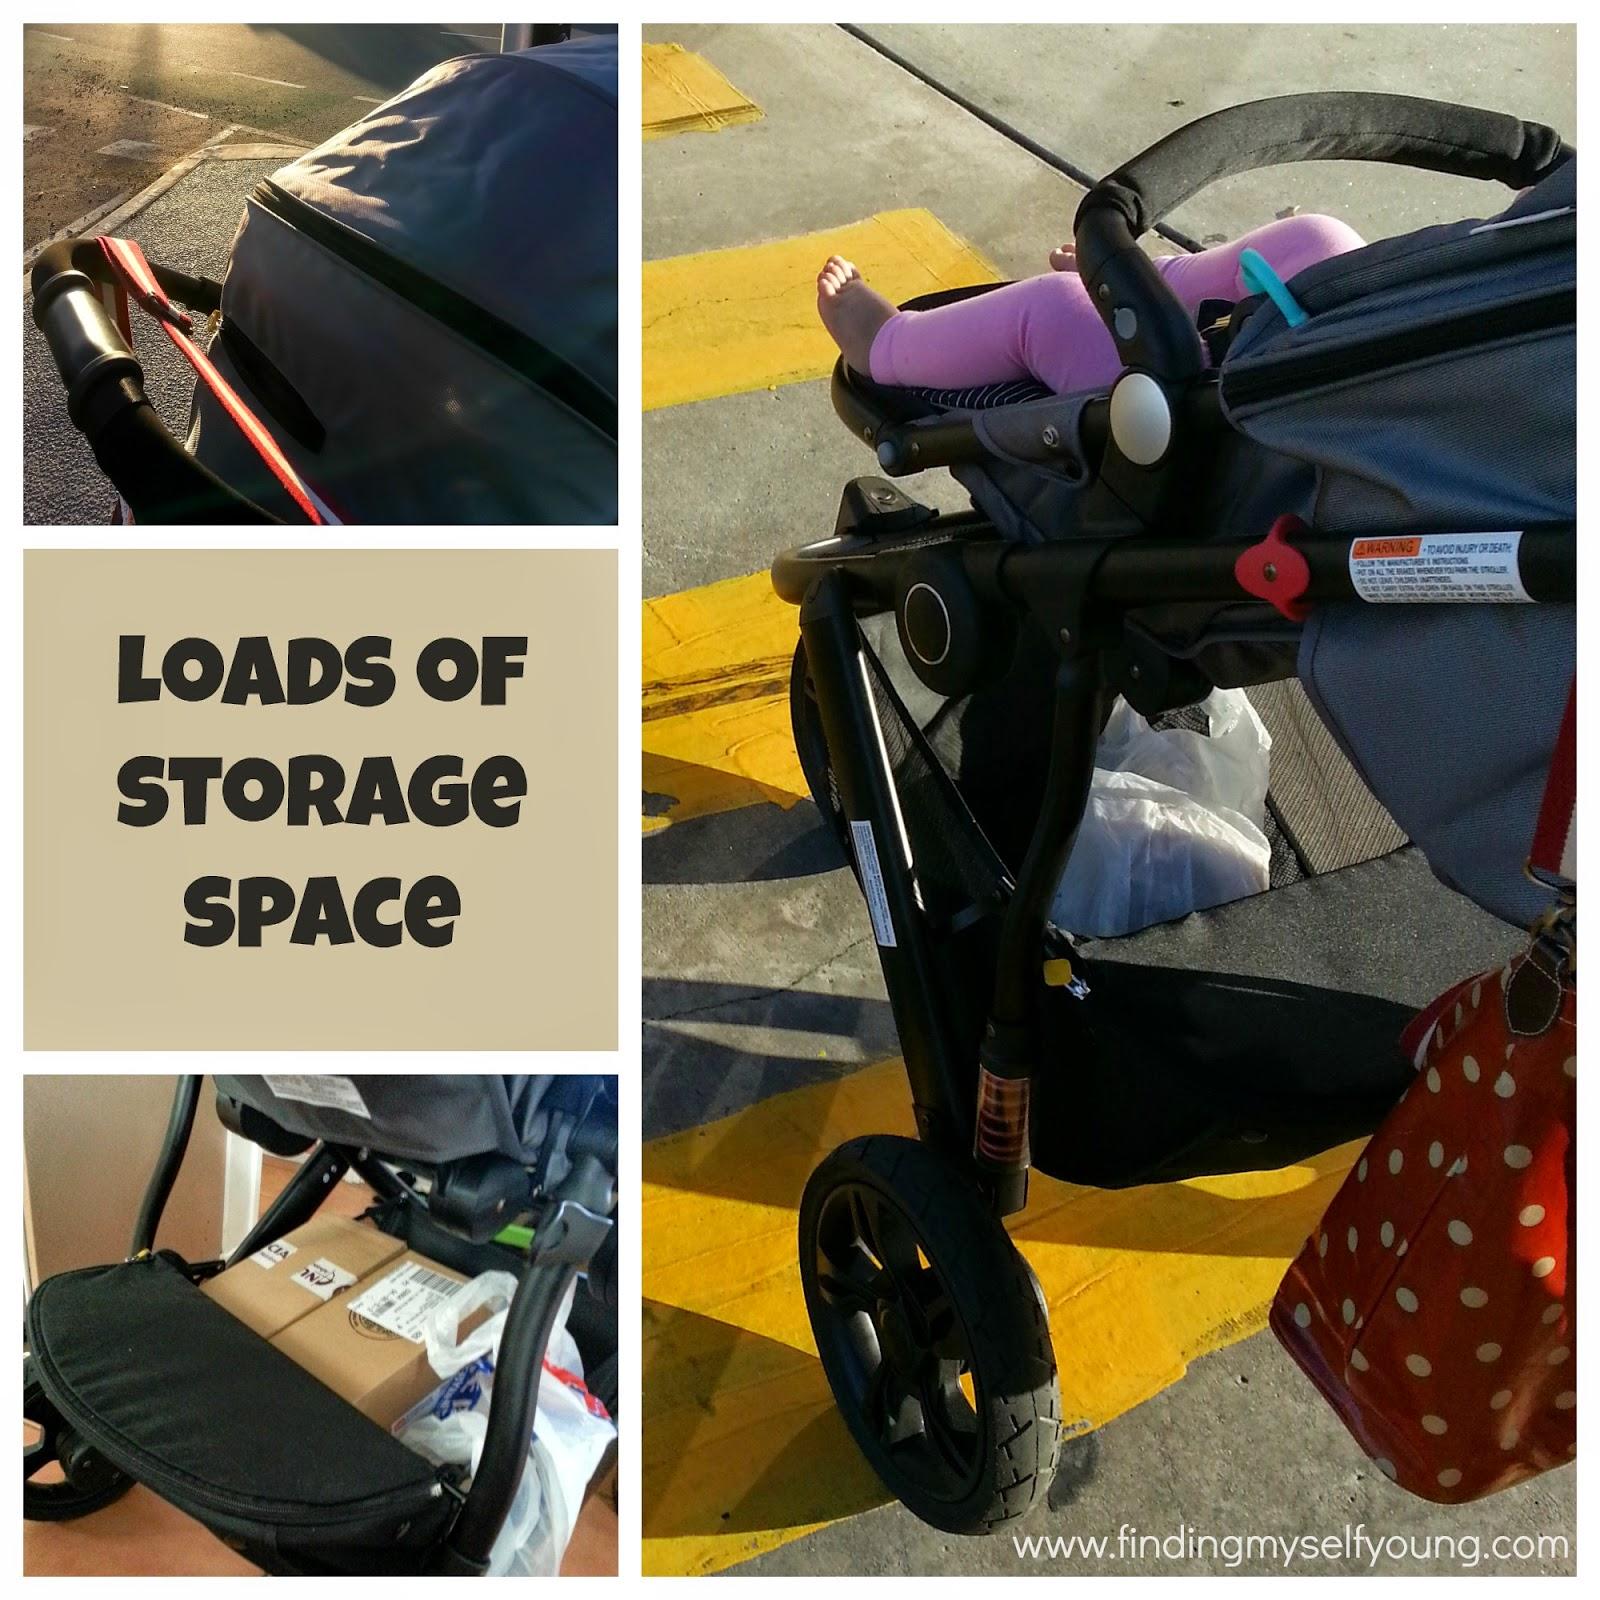 Safety 1st Wanderer pram storage space